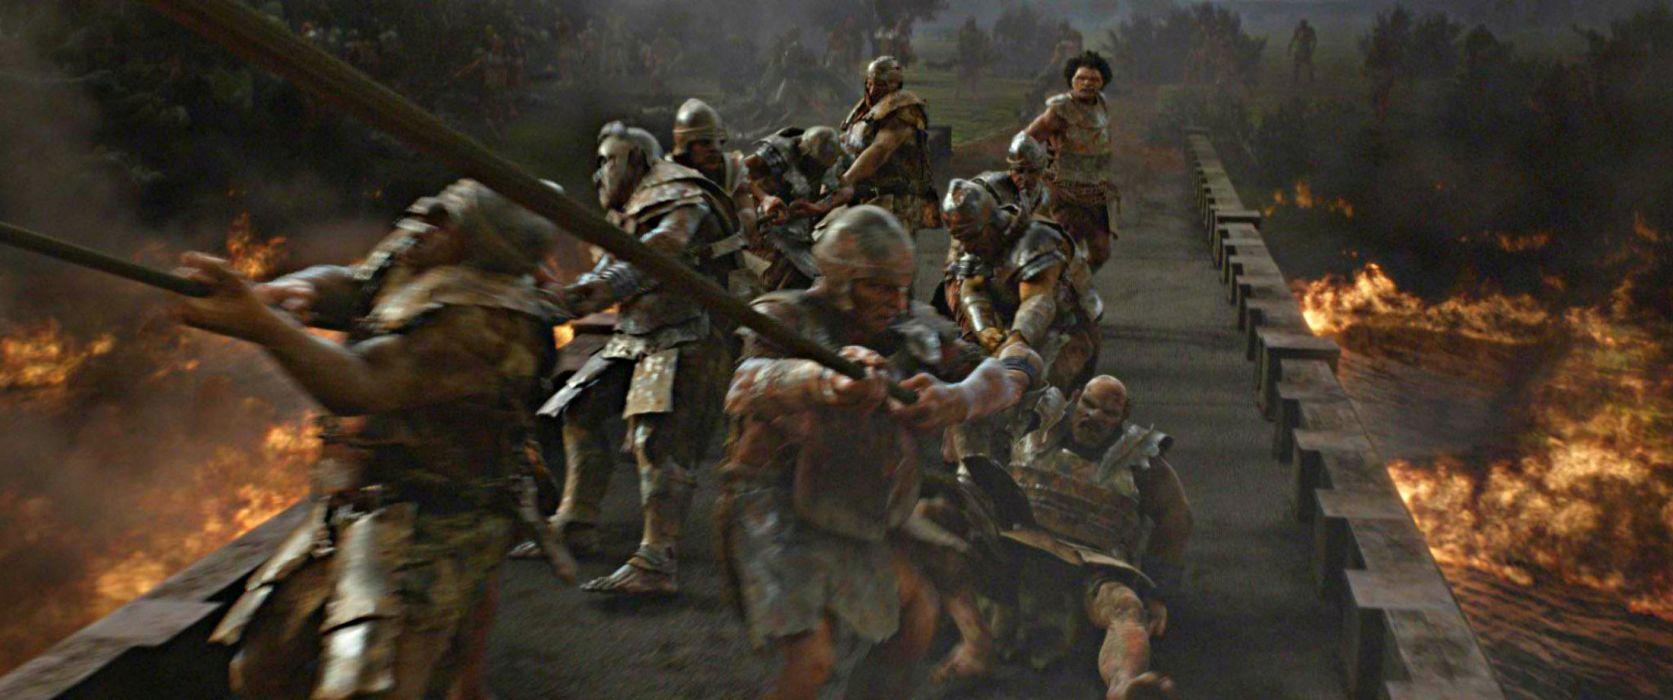 Jack The Giant Slayer 2013 fantasy adventure battle     g wallpaper